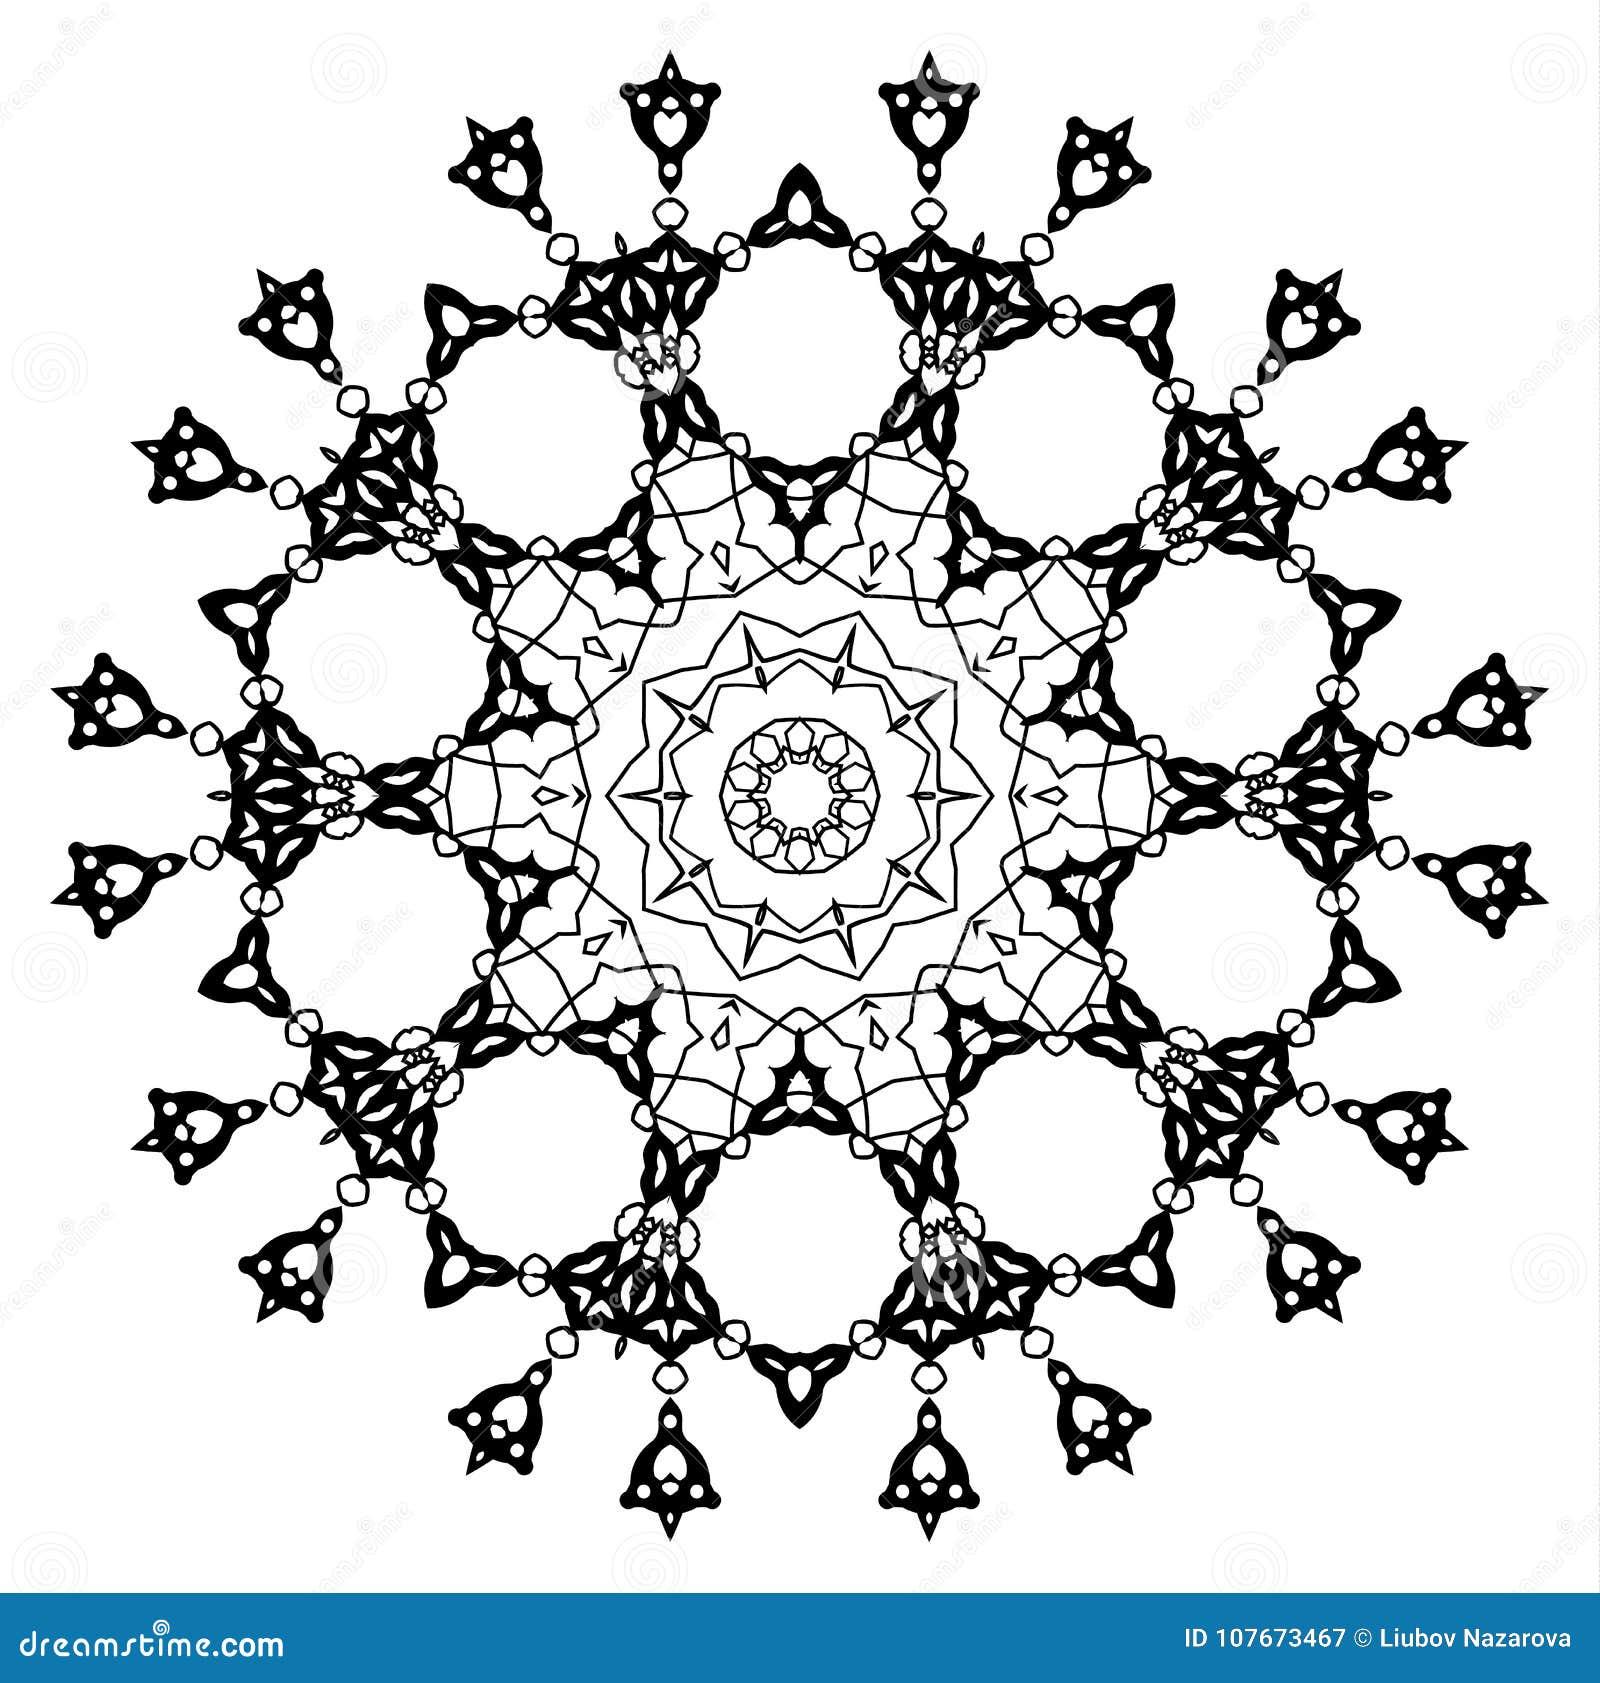 Snowflake Mandala Vintage Decorative Elements Royalty Free Illustration